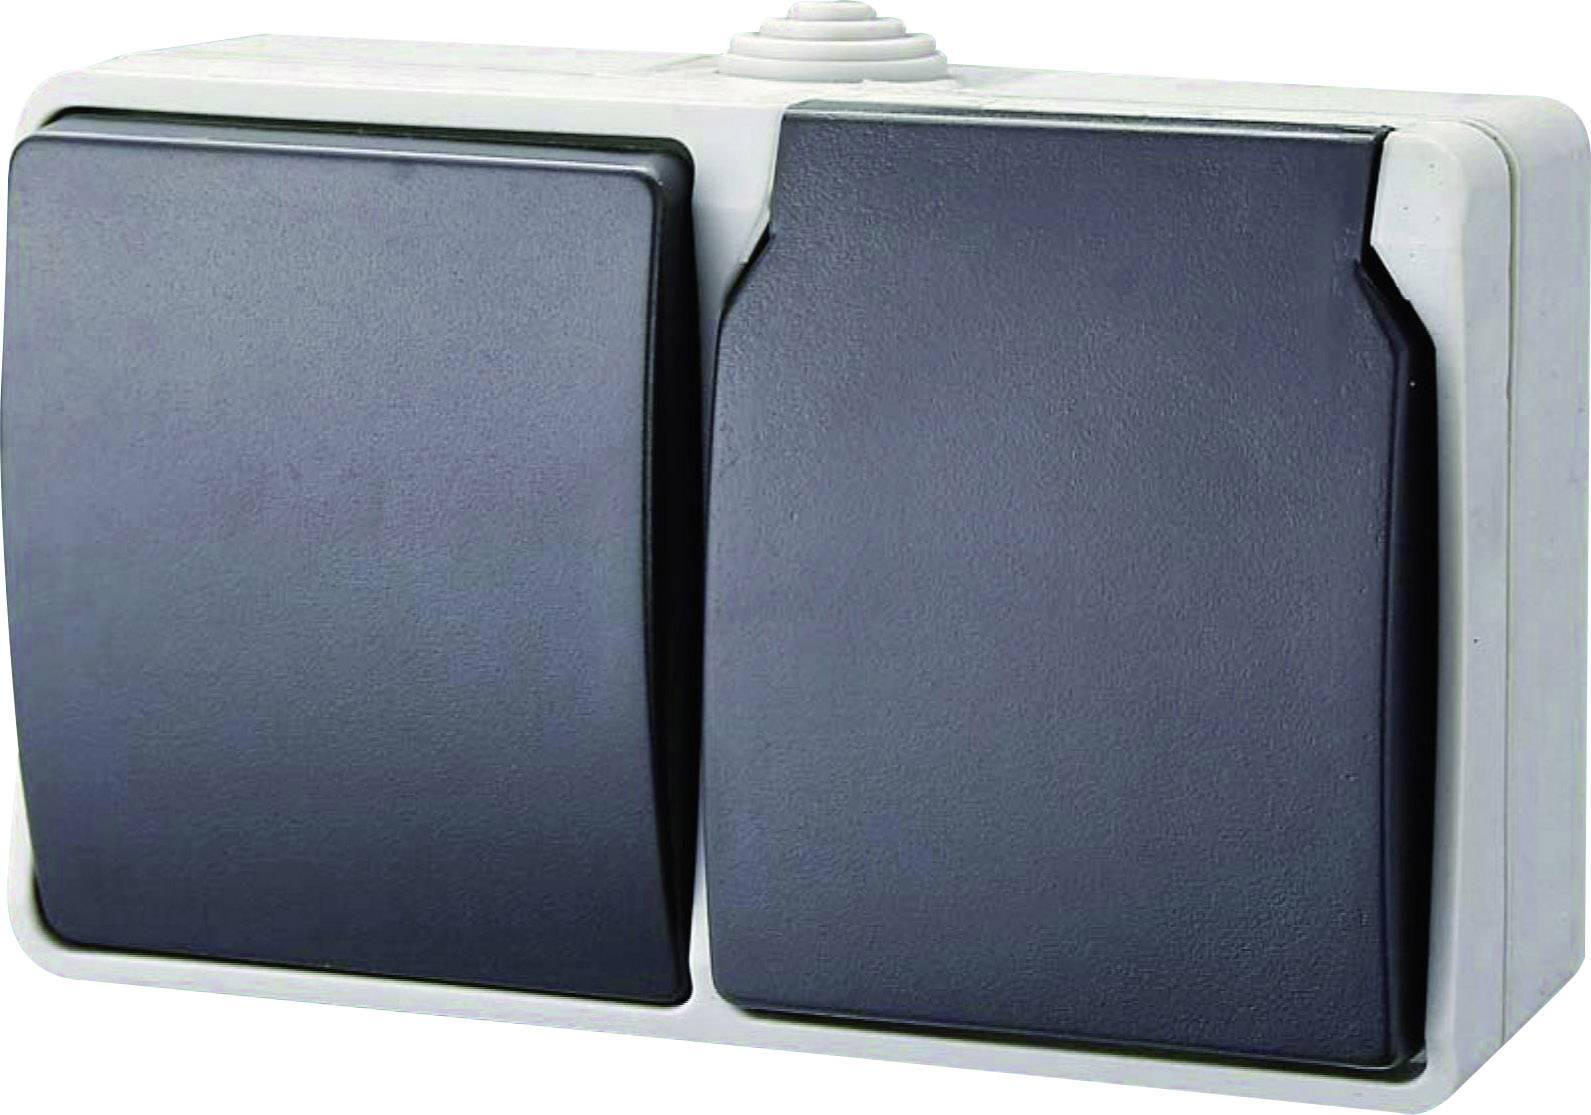 GAO Wechselschalter Ausschalter Schalter Steckdosen IP54 Standard Grau